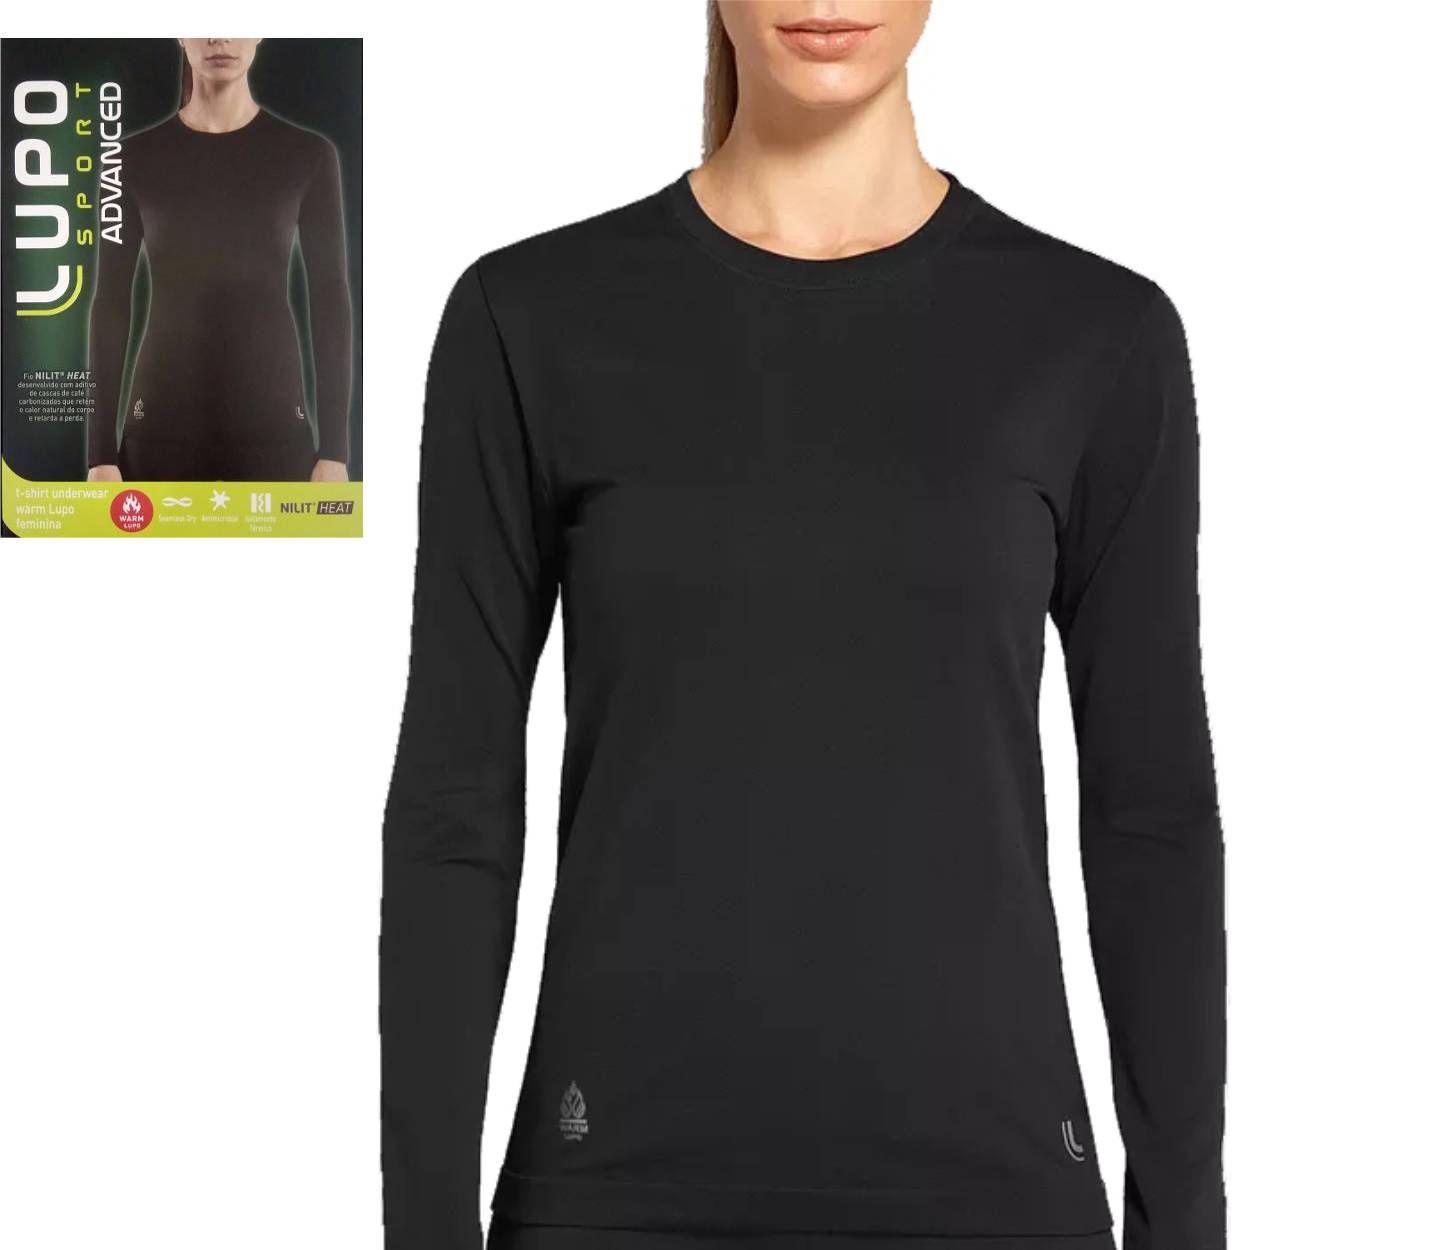 Camiseta Térmica Feminina Manga Longa Warm Lupo Nilit Heat 71633-001